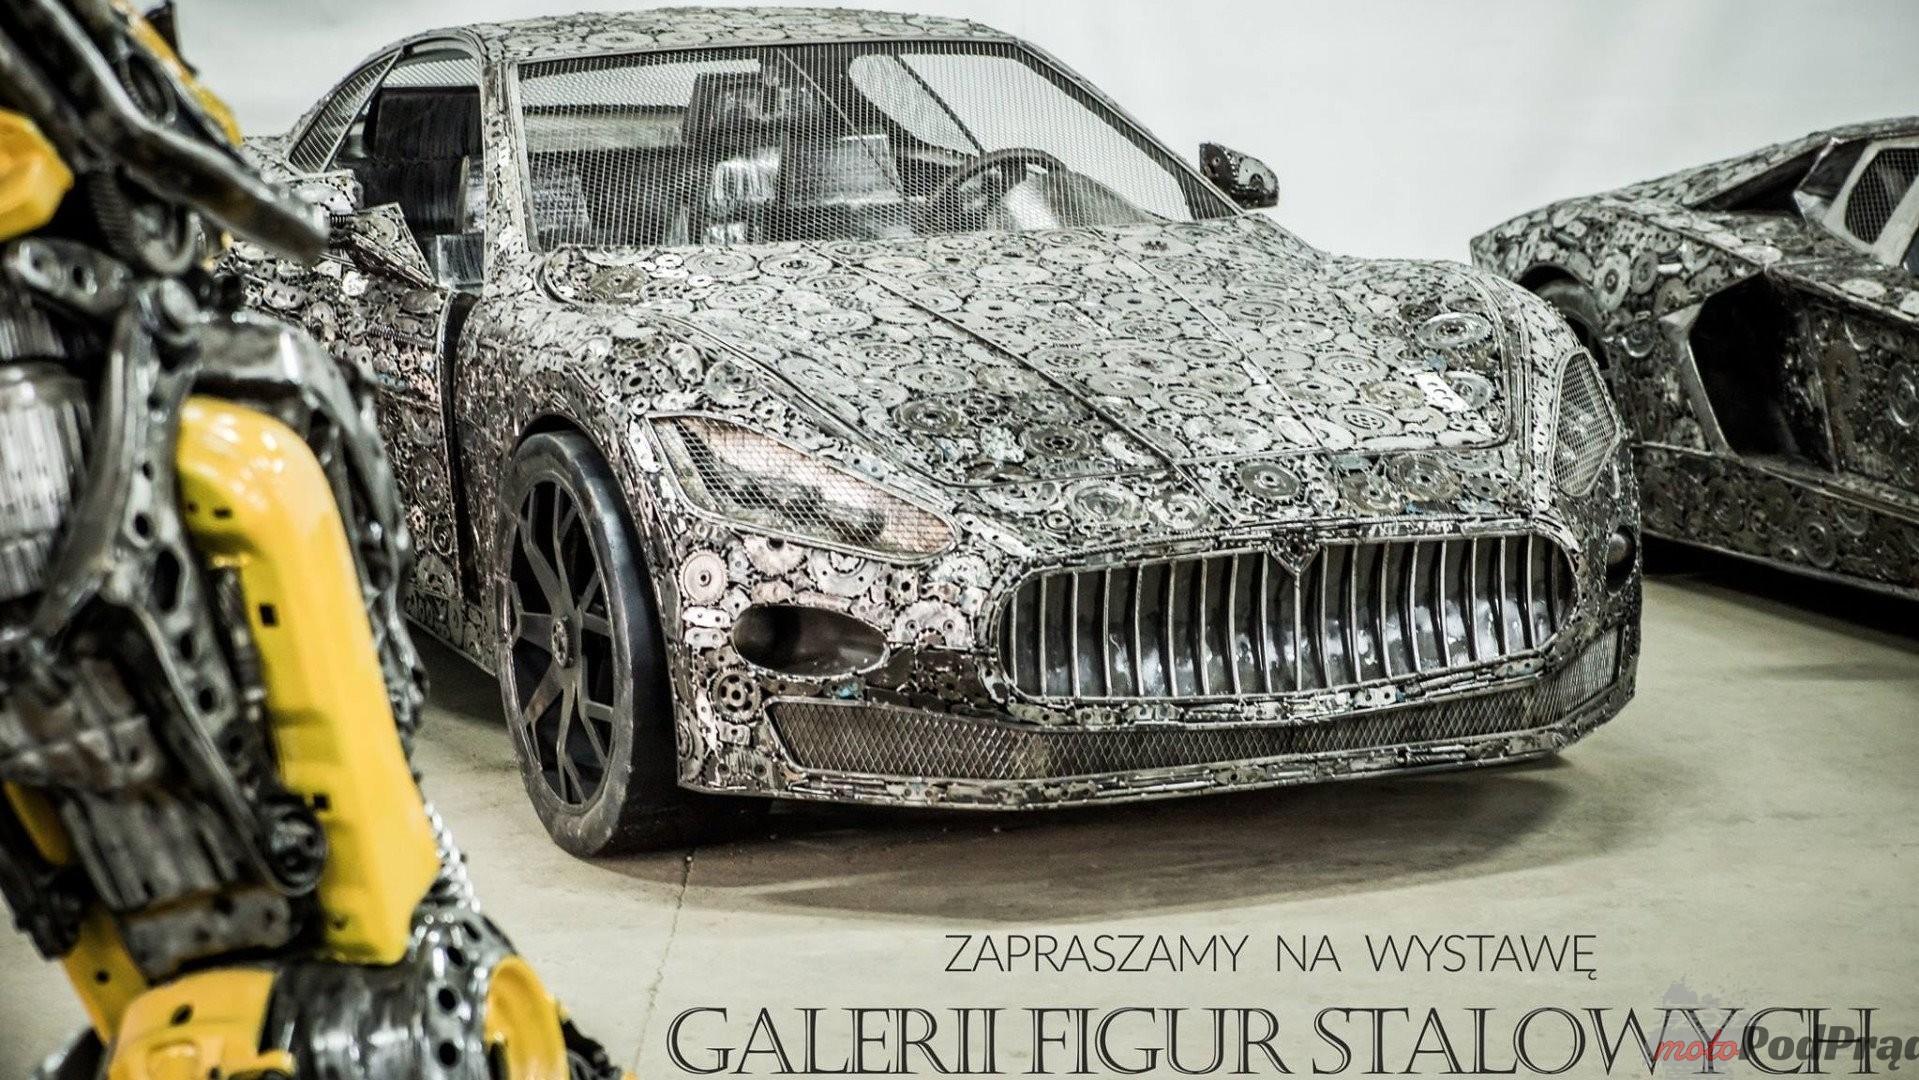 scrap metal supercar sculptures 1 Unikalne dzieła sztuki pod Warszawą